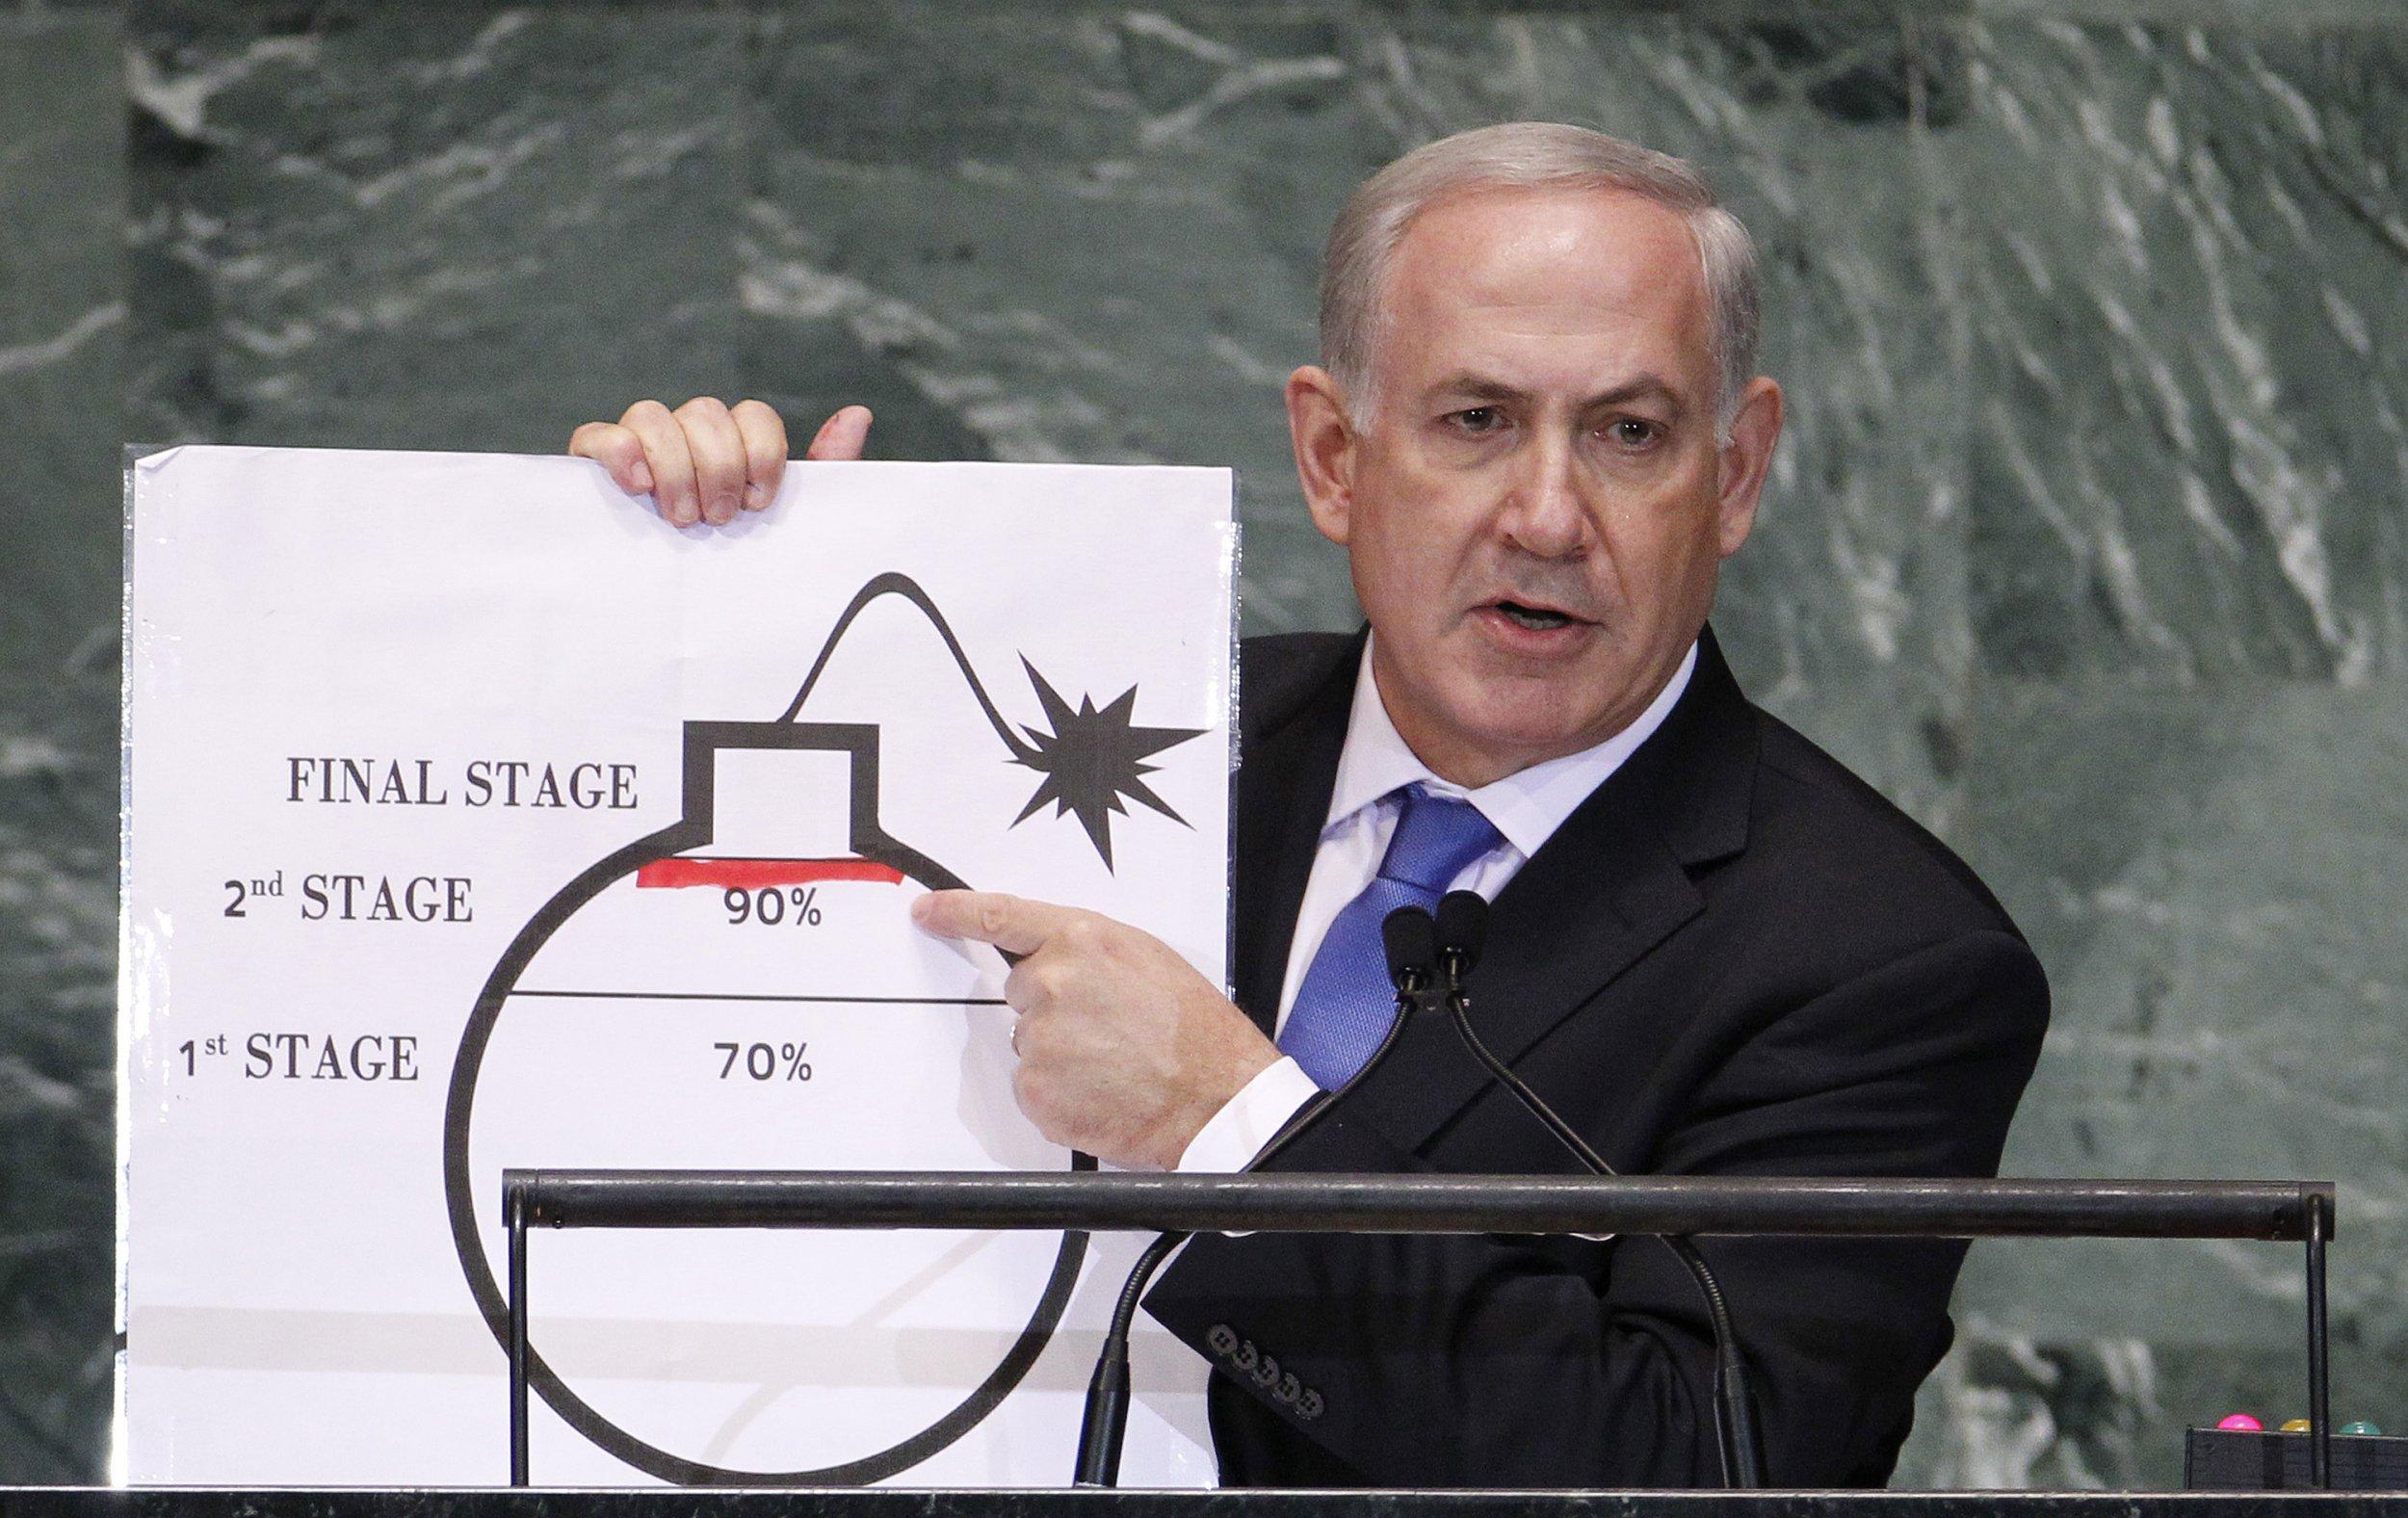 Attacking Iran, by Philip Giraldi - The Unz Review